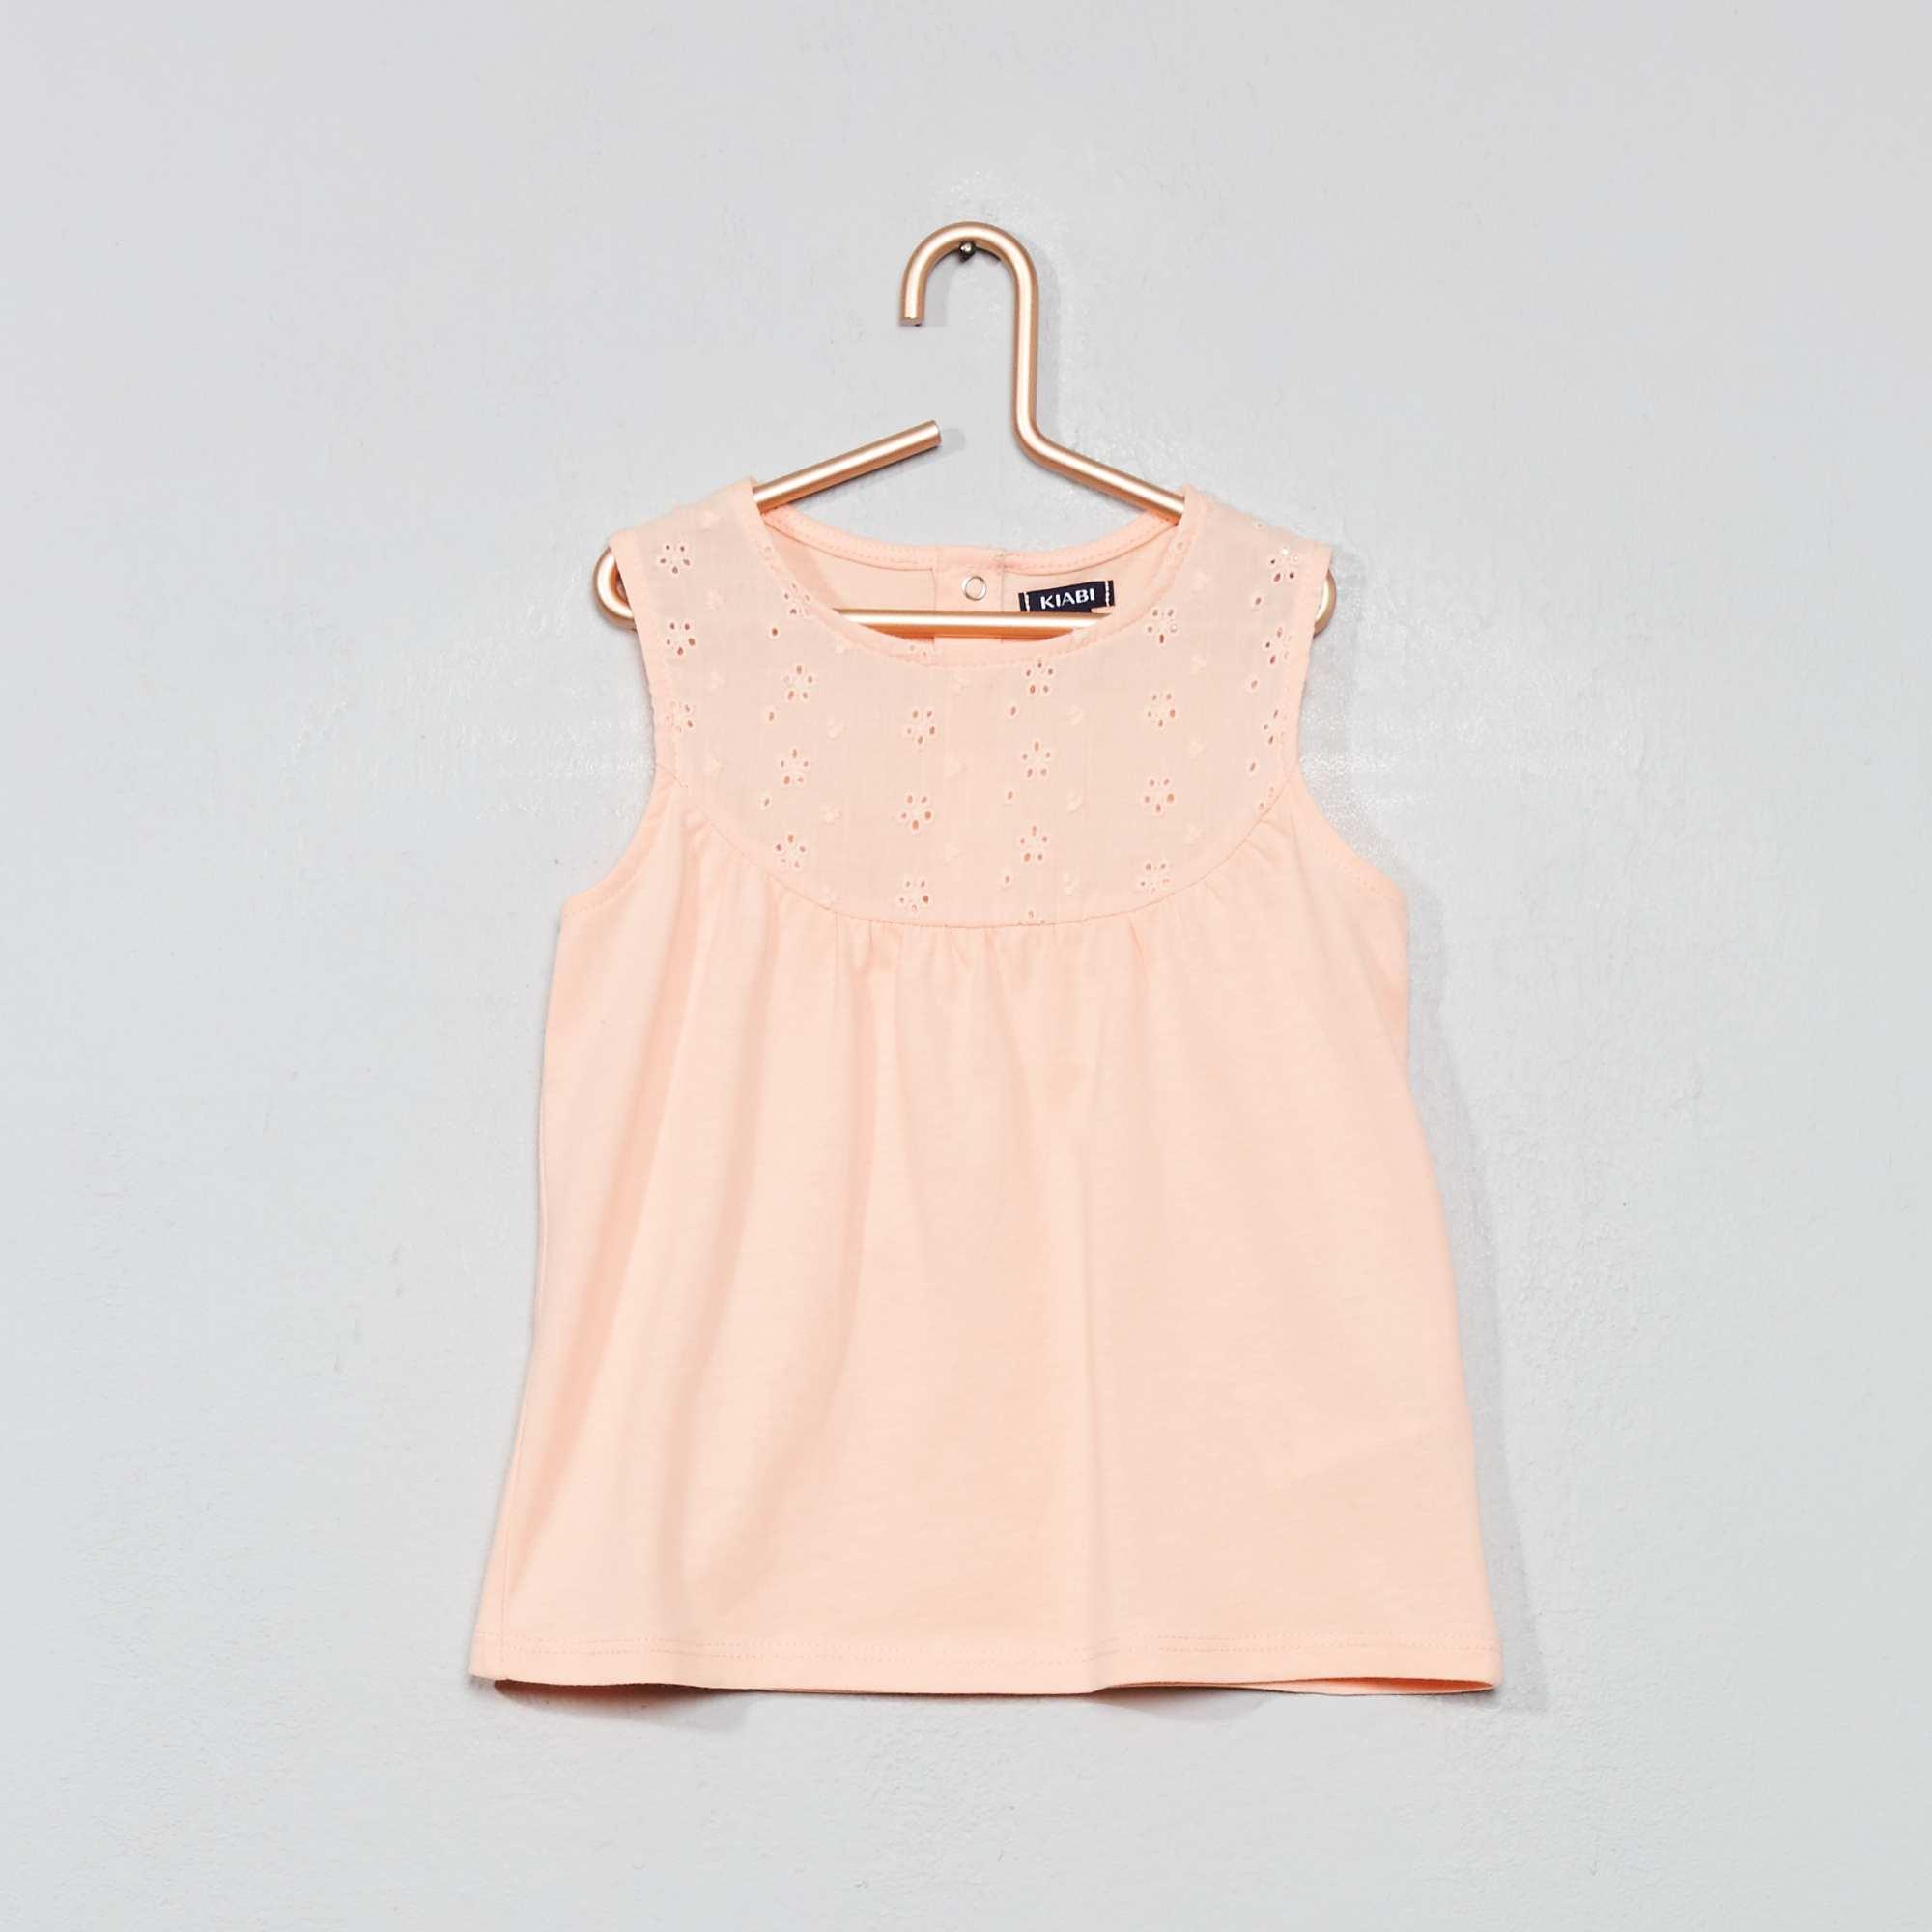 672a20f5e Camiseta sin mangas con bordado inglés NARANJA Bebé niña. Loading zoom